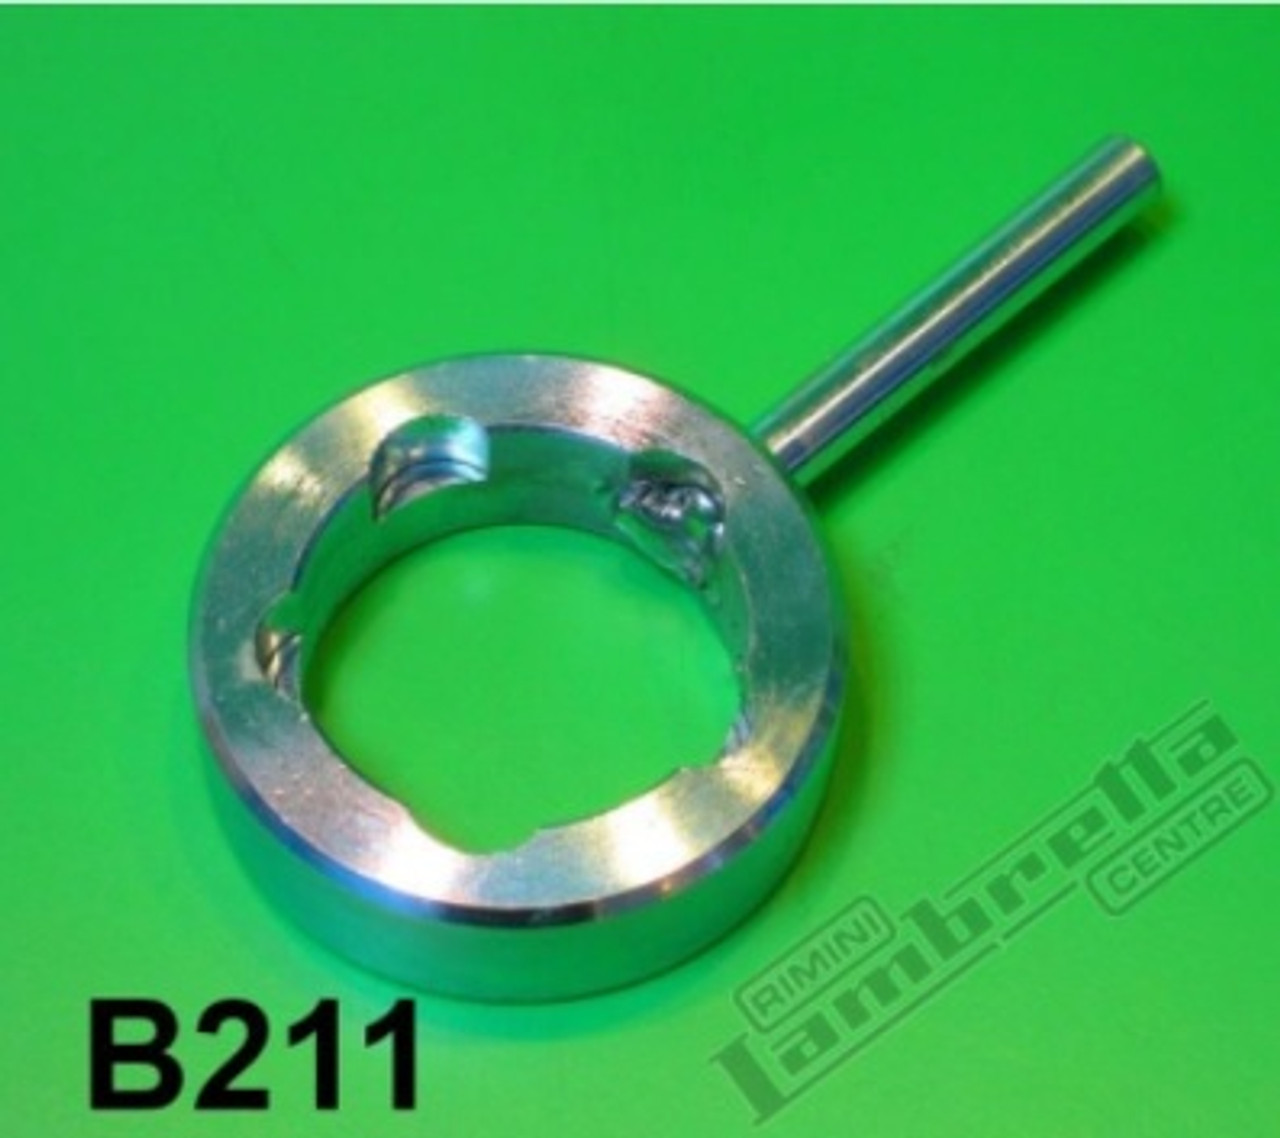 Lambretta Clutch Holding Tool Casa (131A-B211)